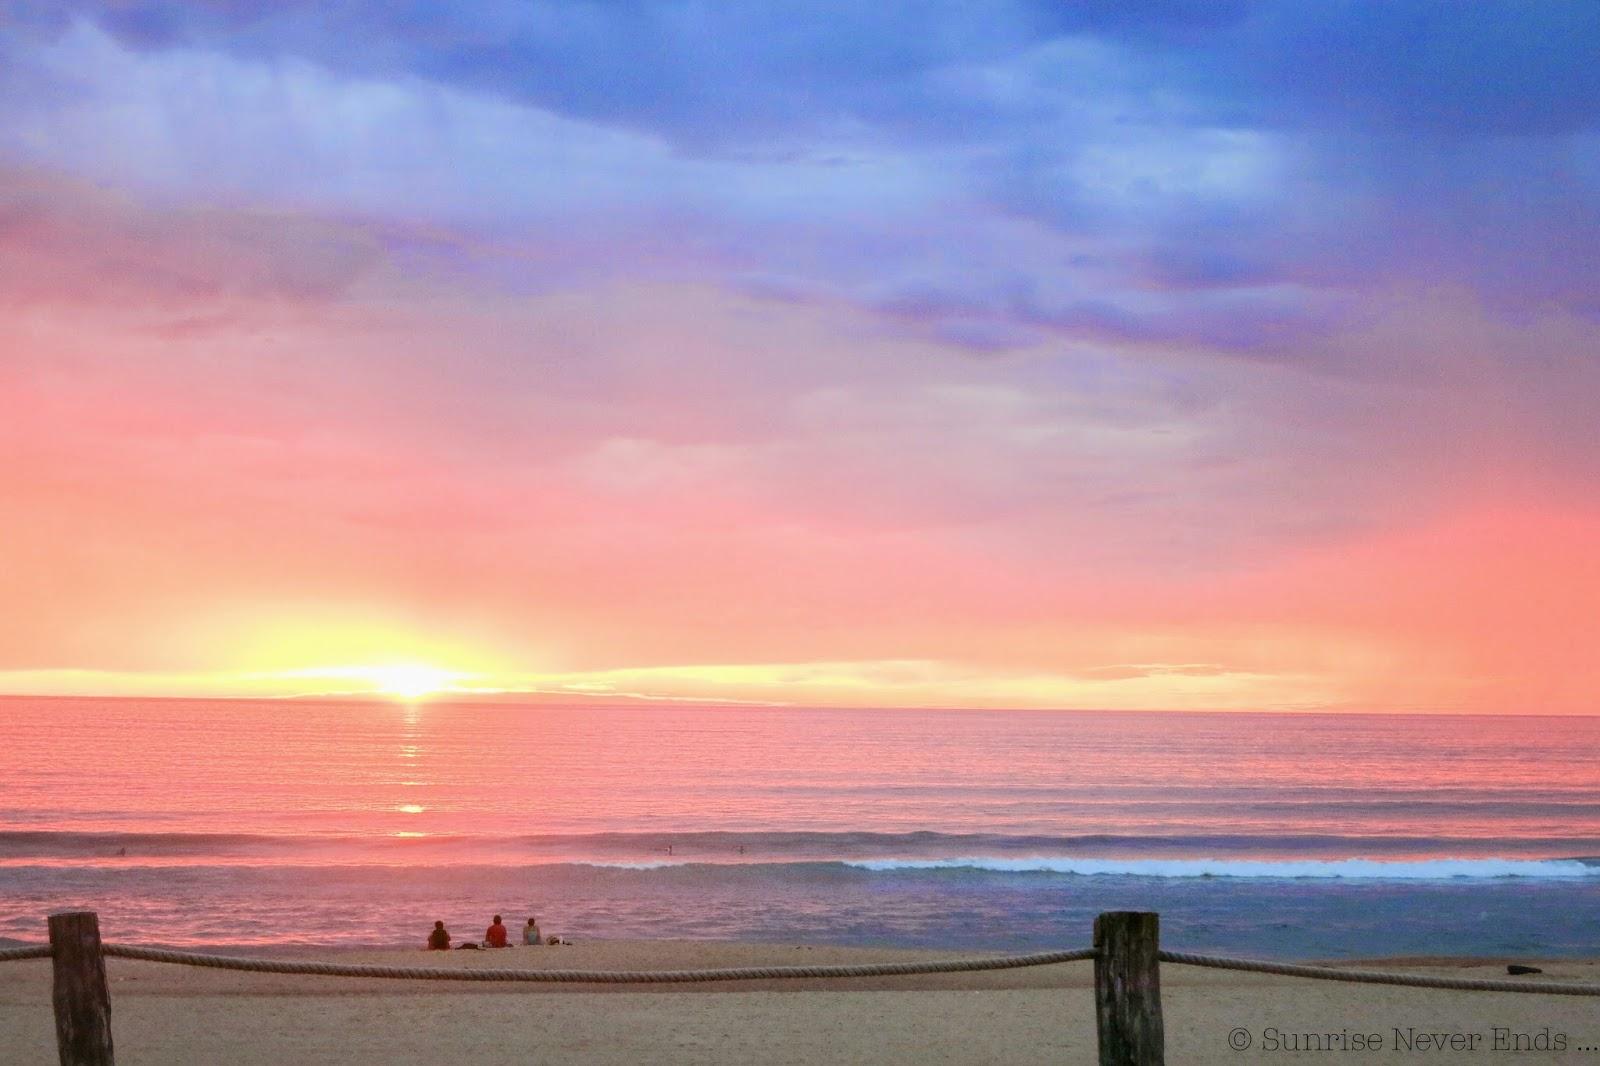 sunset,sunsetforever,hossegor,les culs nuls,citron,kate spade